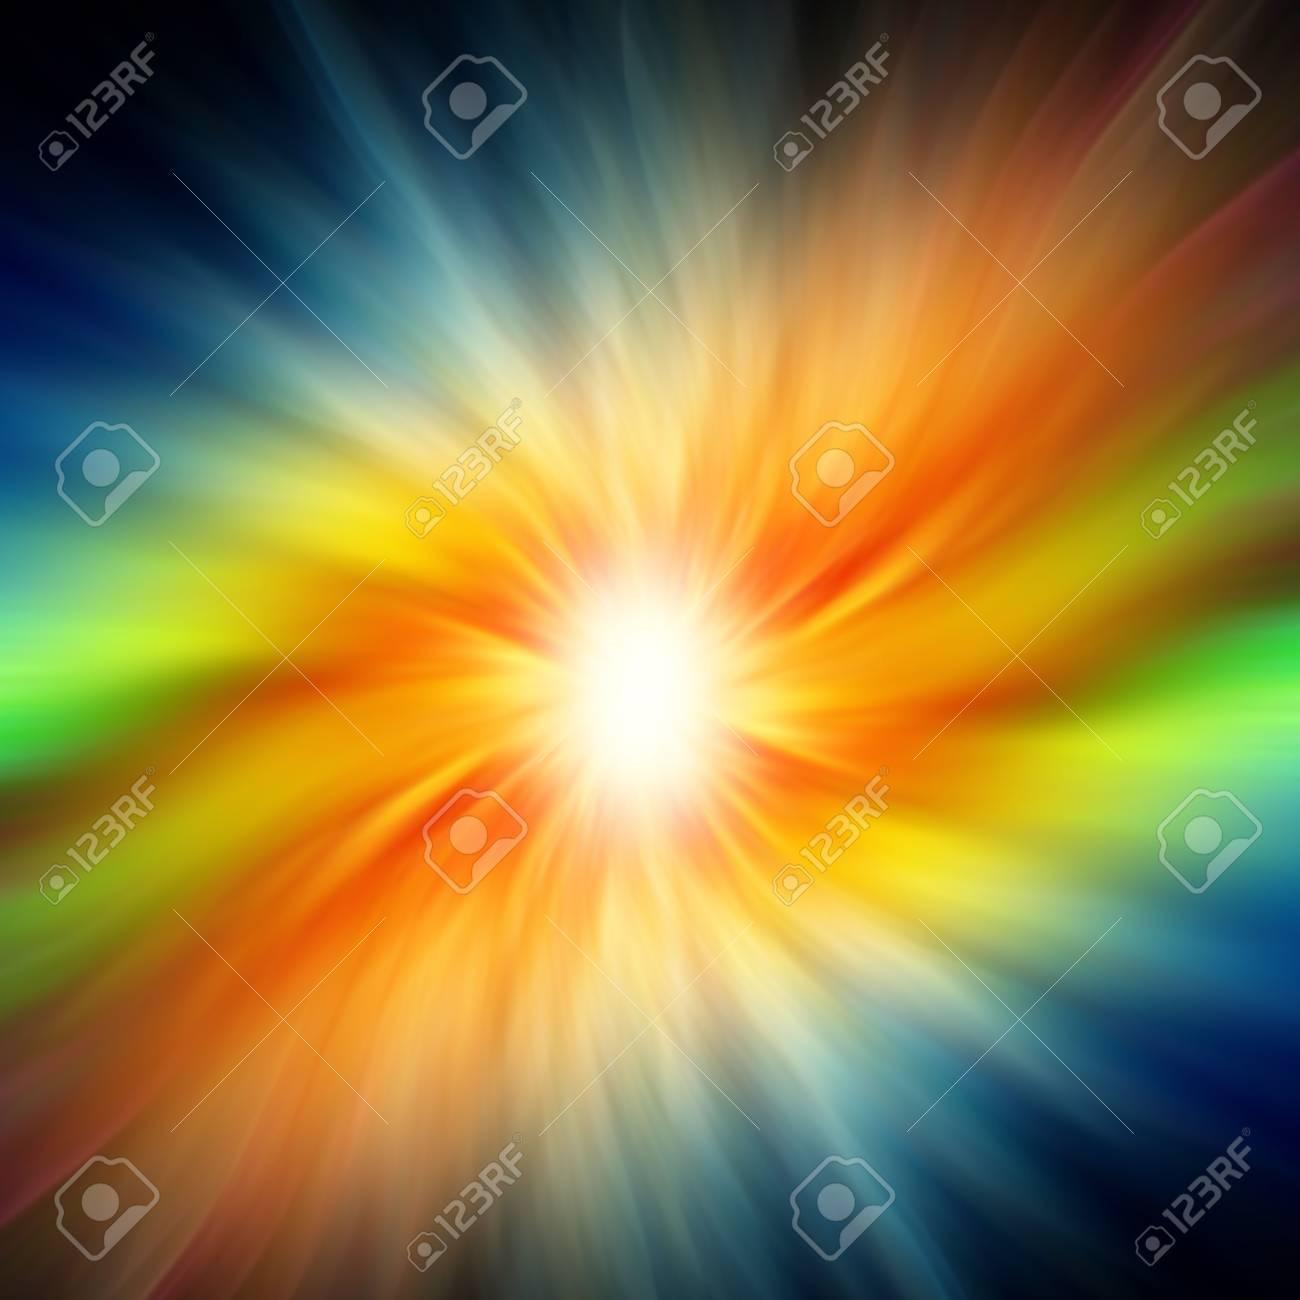 Abstract light Stock Photo - 6554700